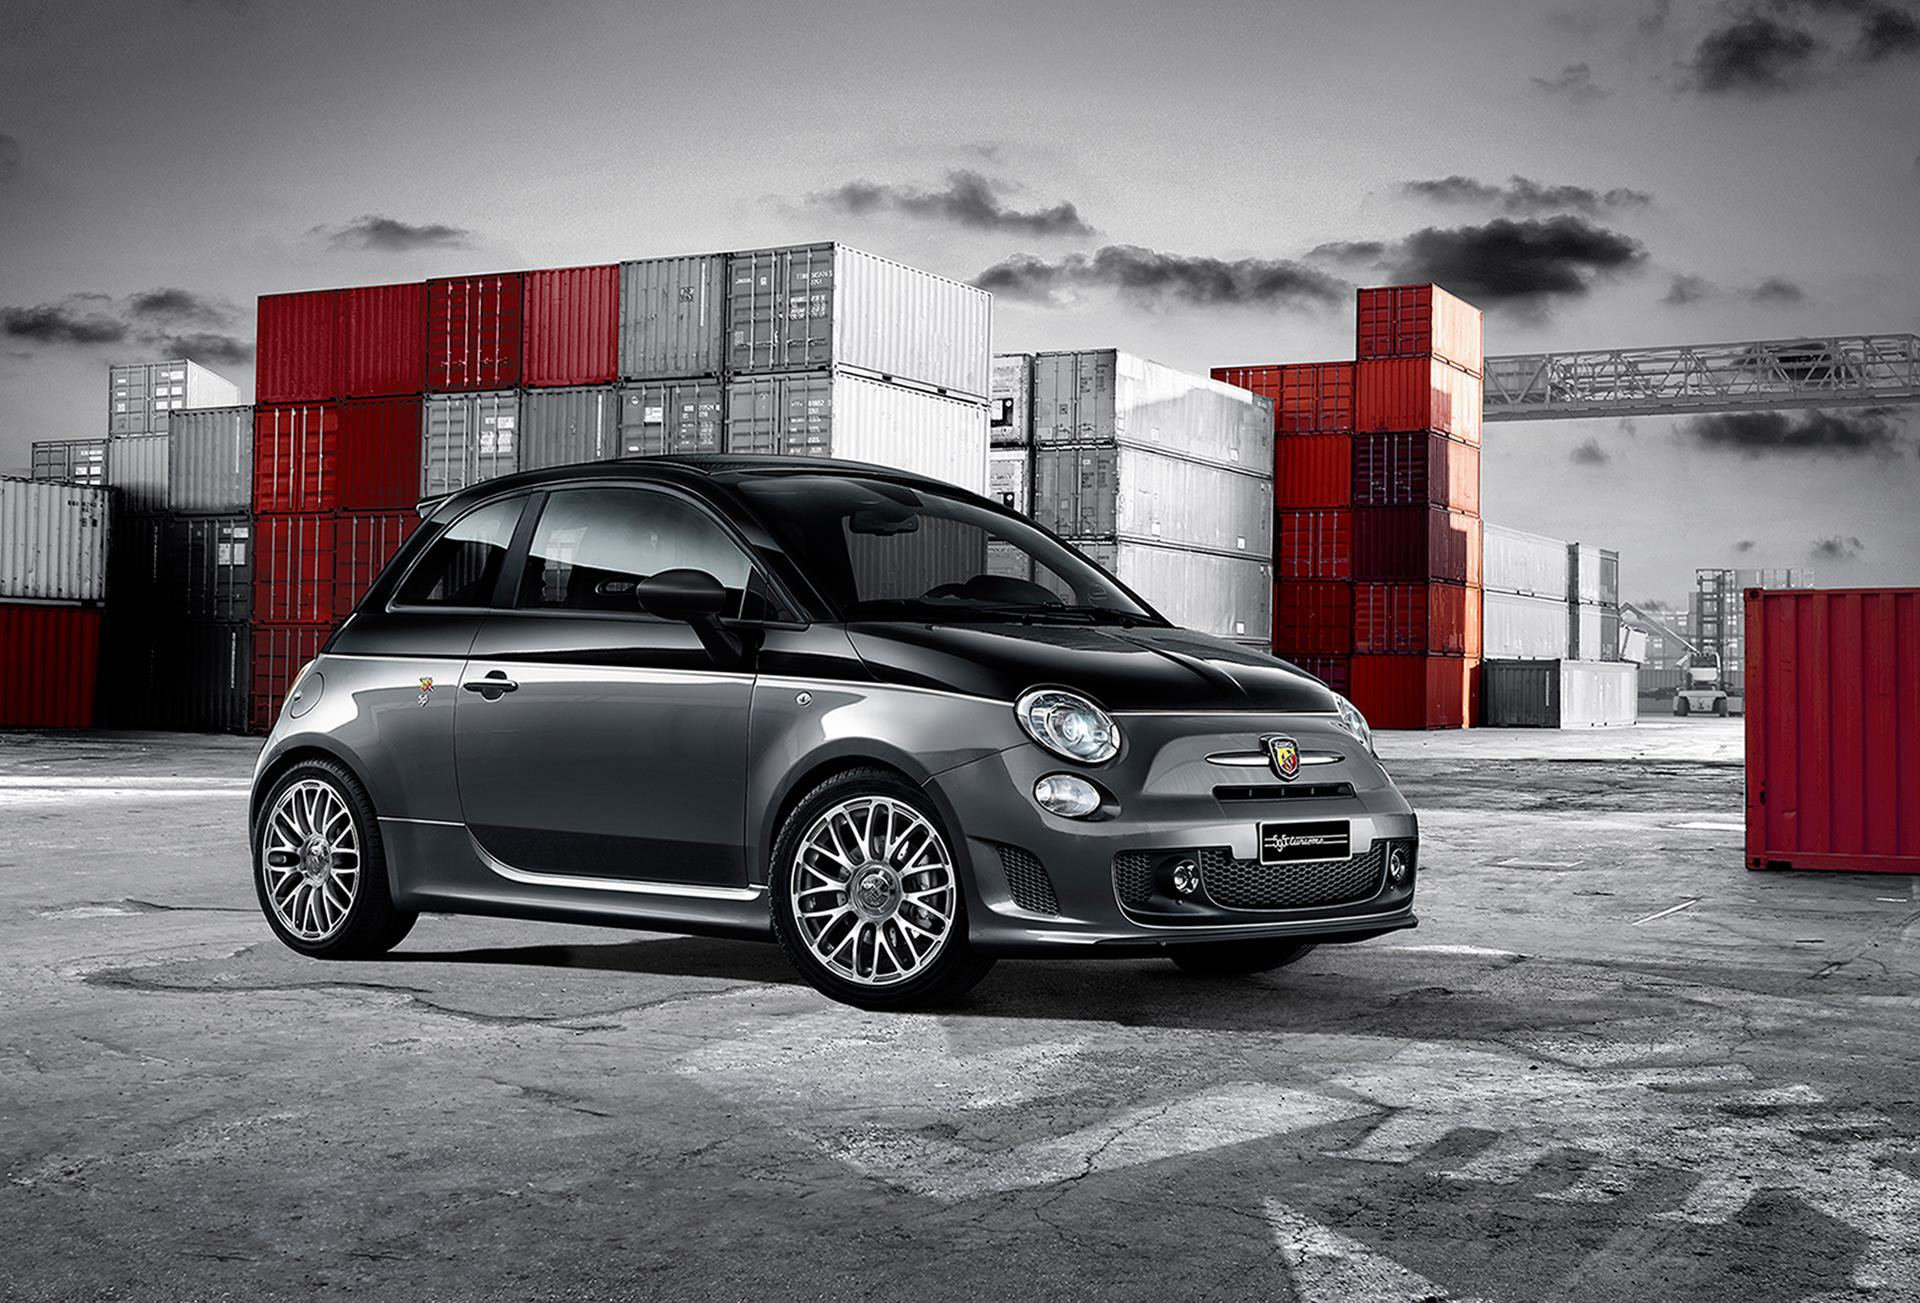 2015 Fiat 500 Bi Colore Edition Technical Specifications